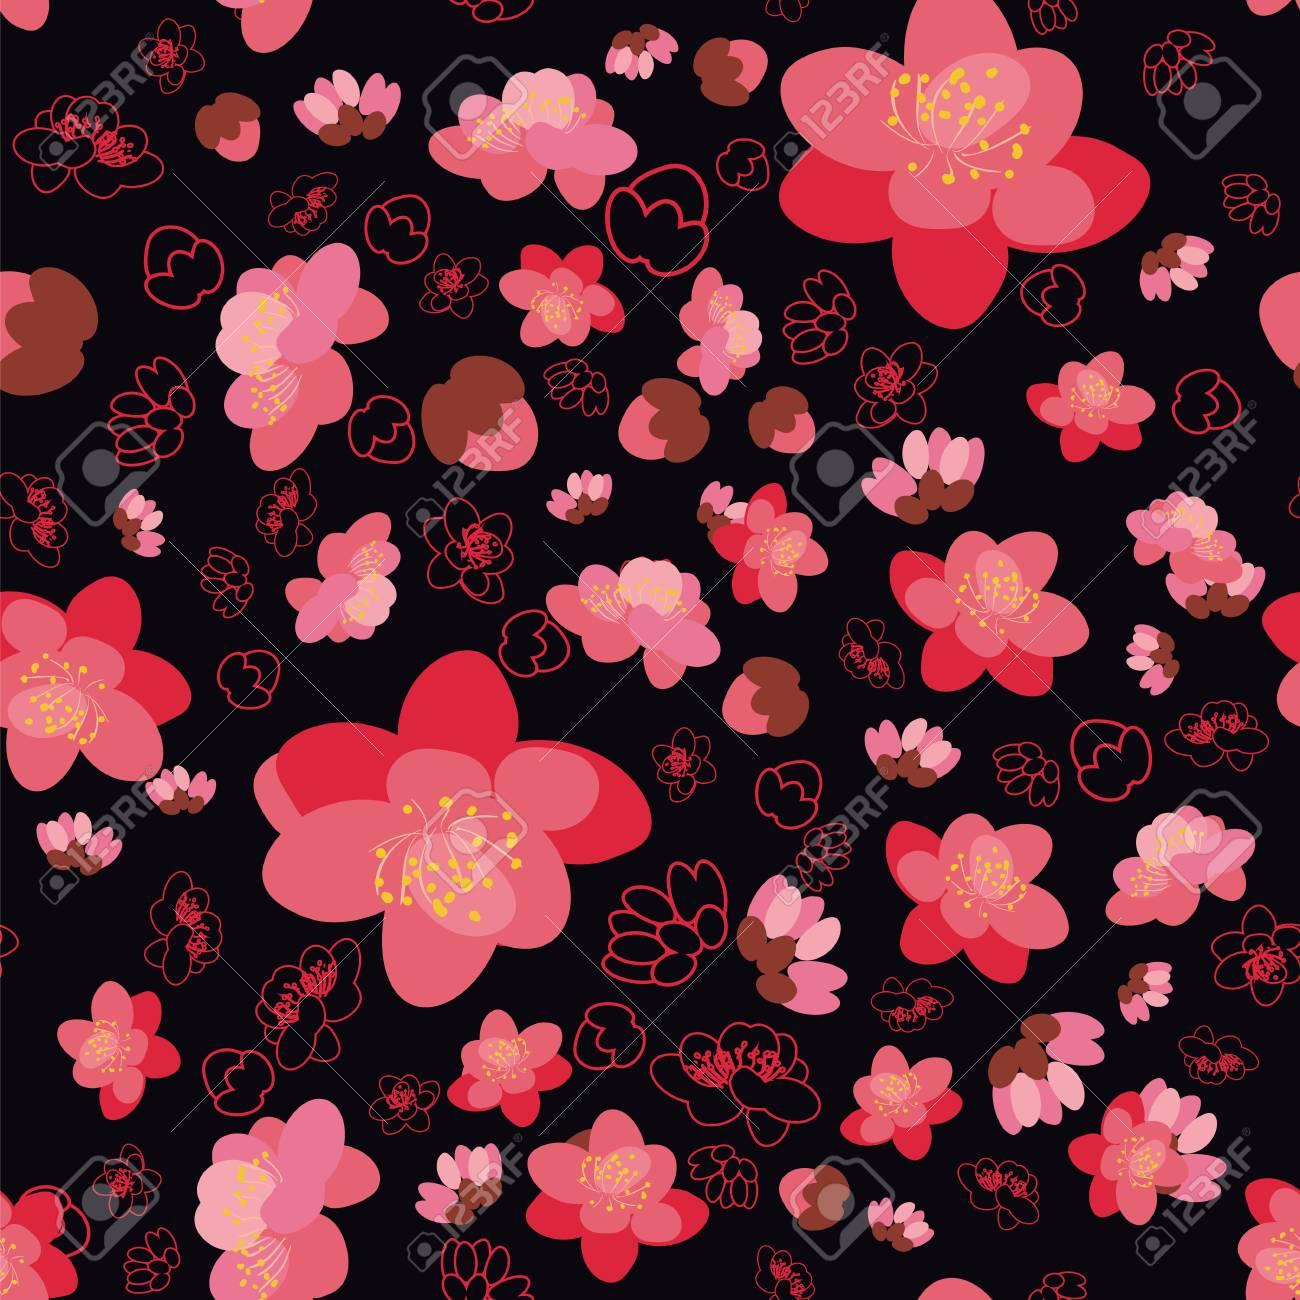 Modele Sans Couture De Fond Tendance Avec Sakura Fleur Cerisier